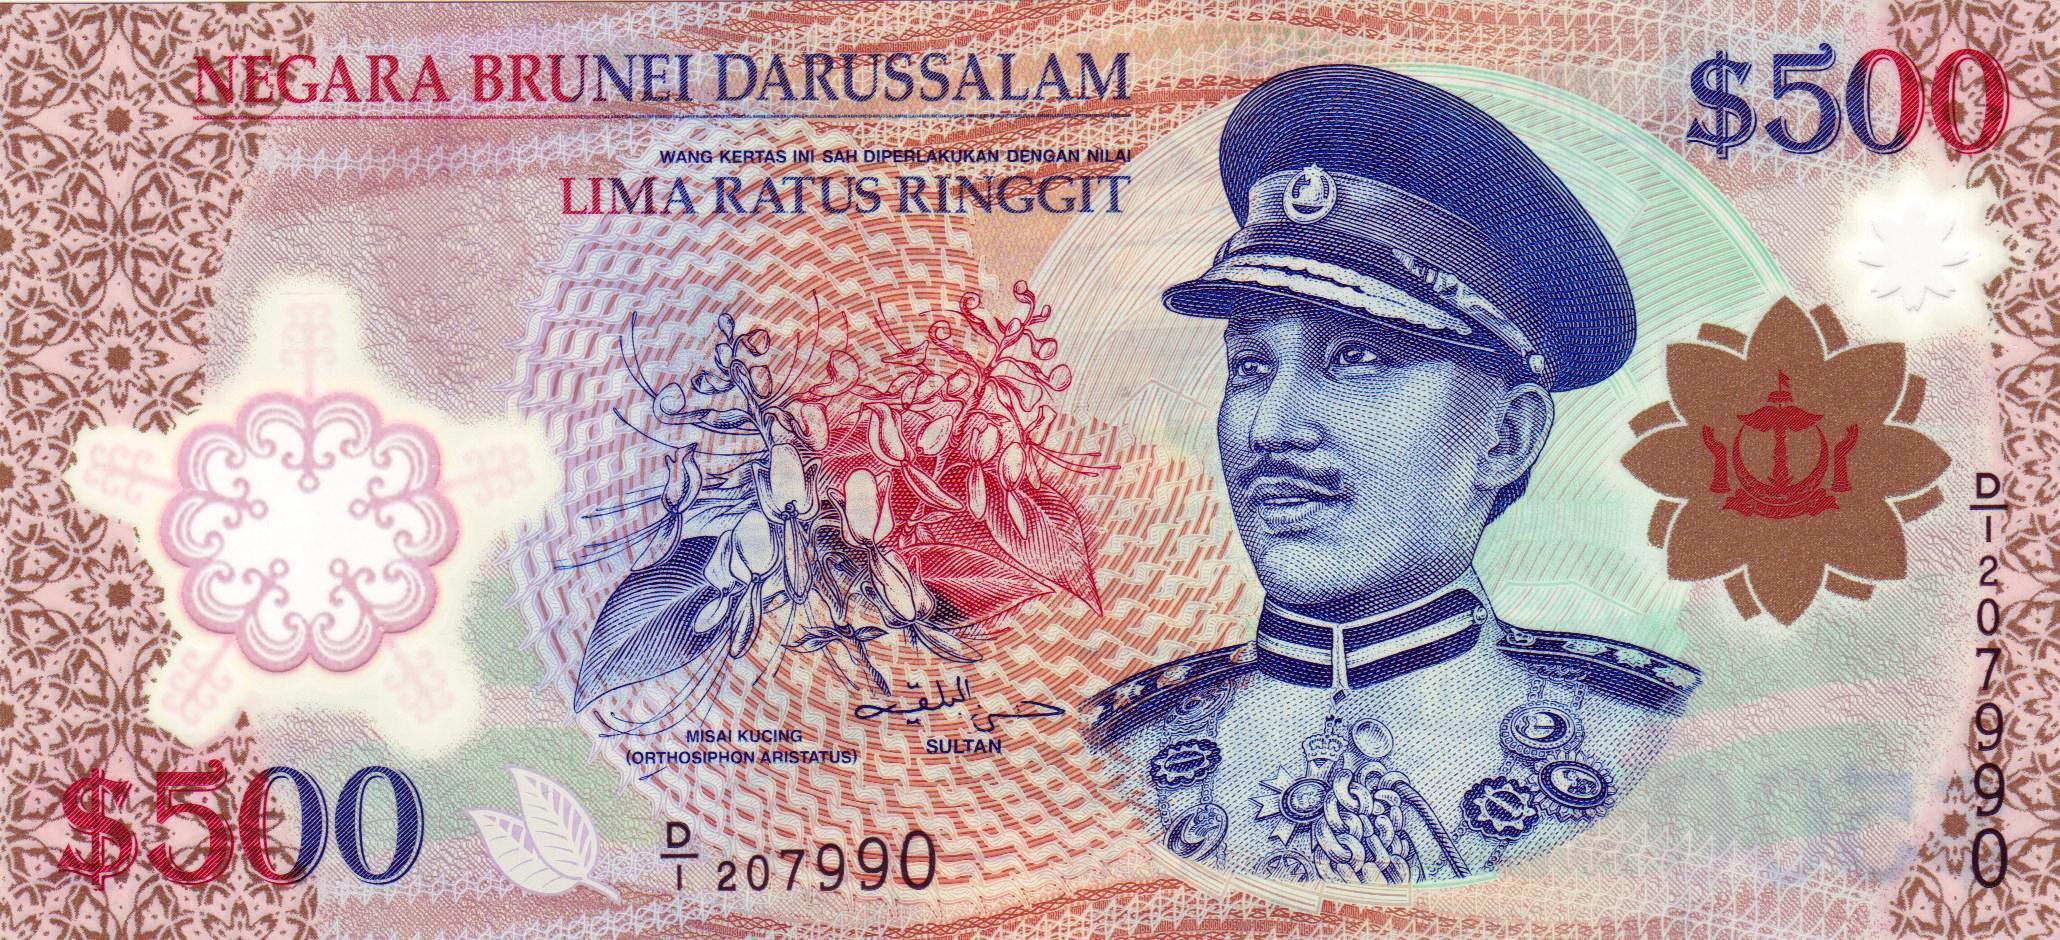 Brunei forex trading